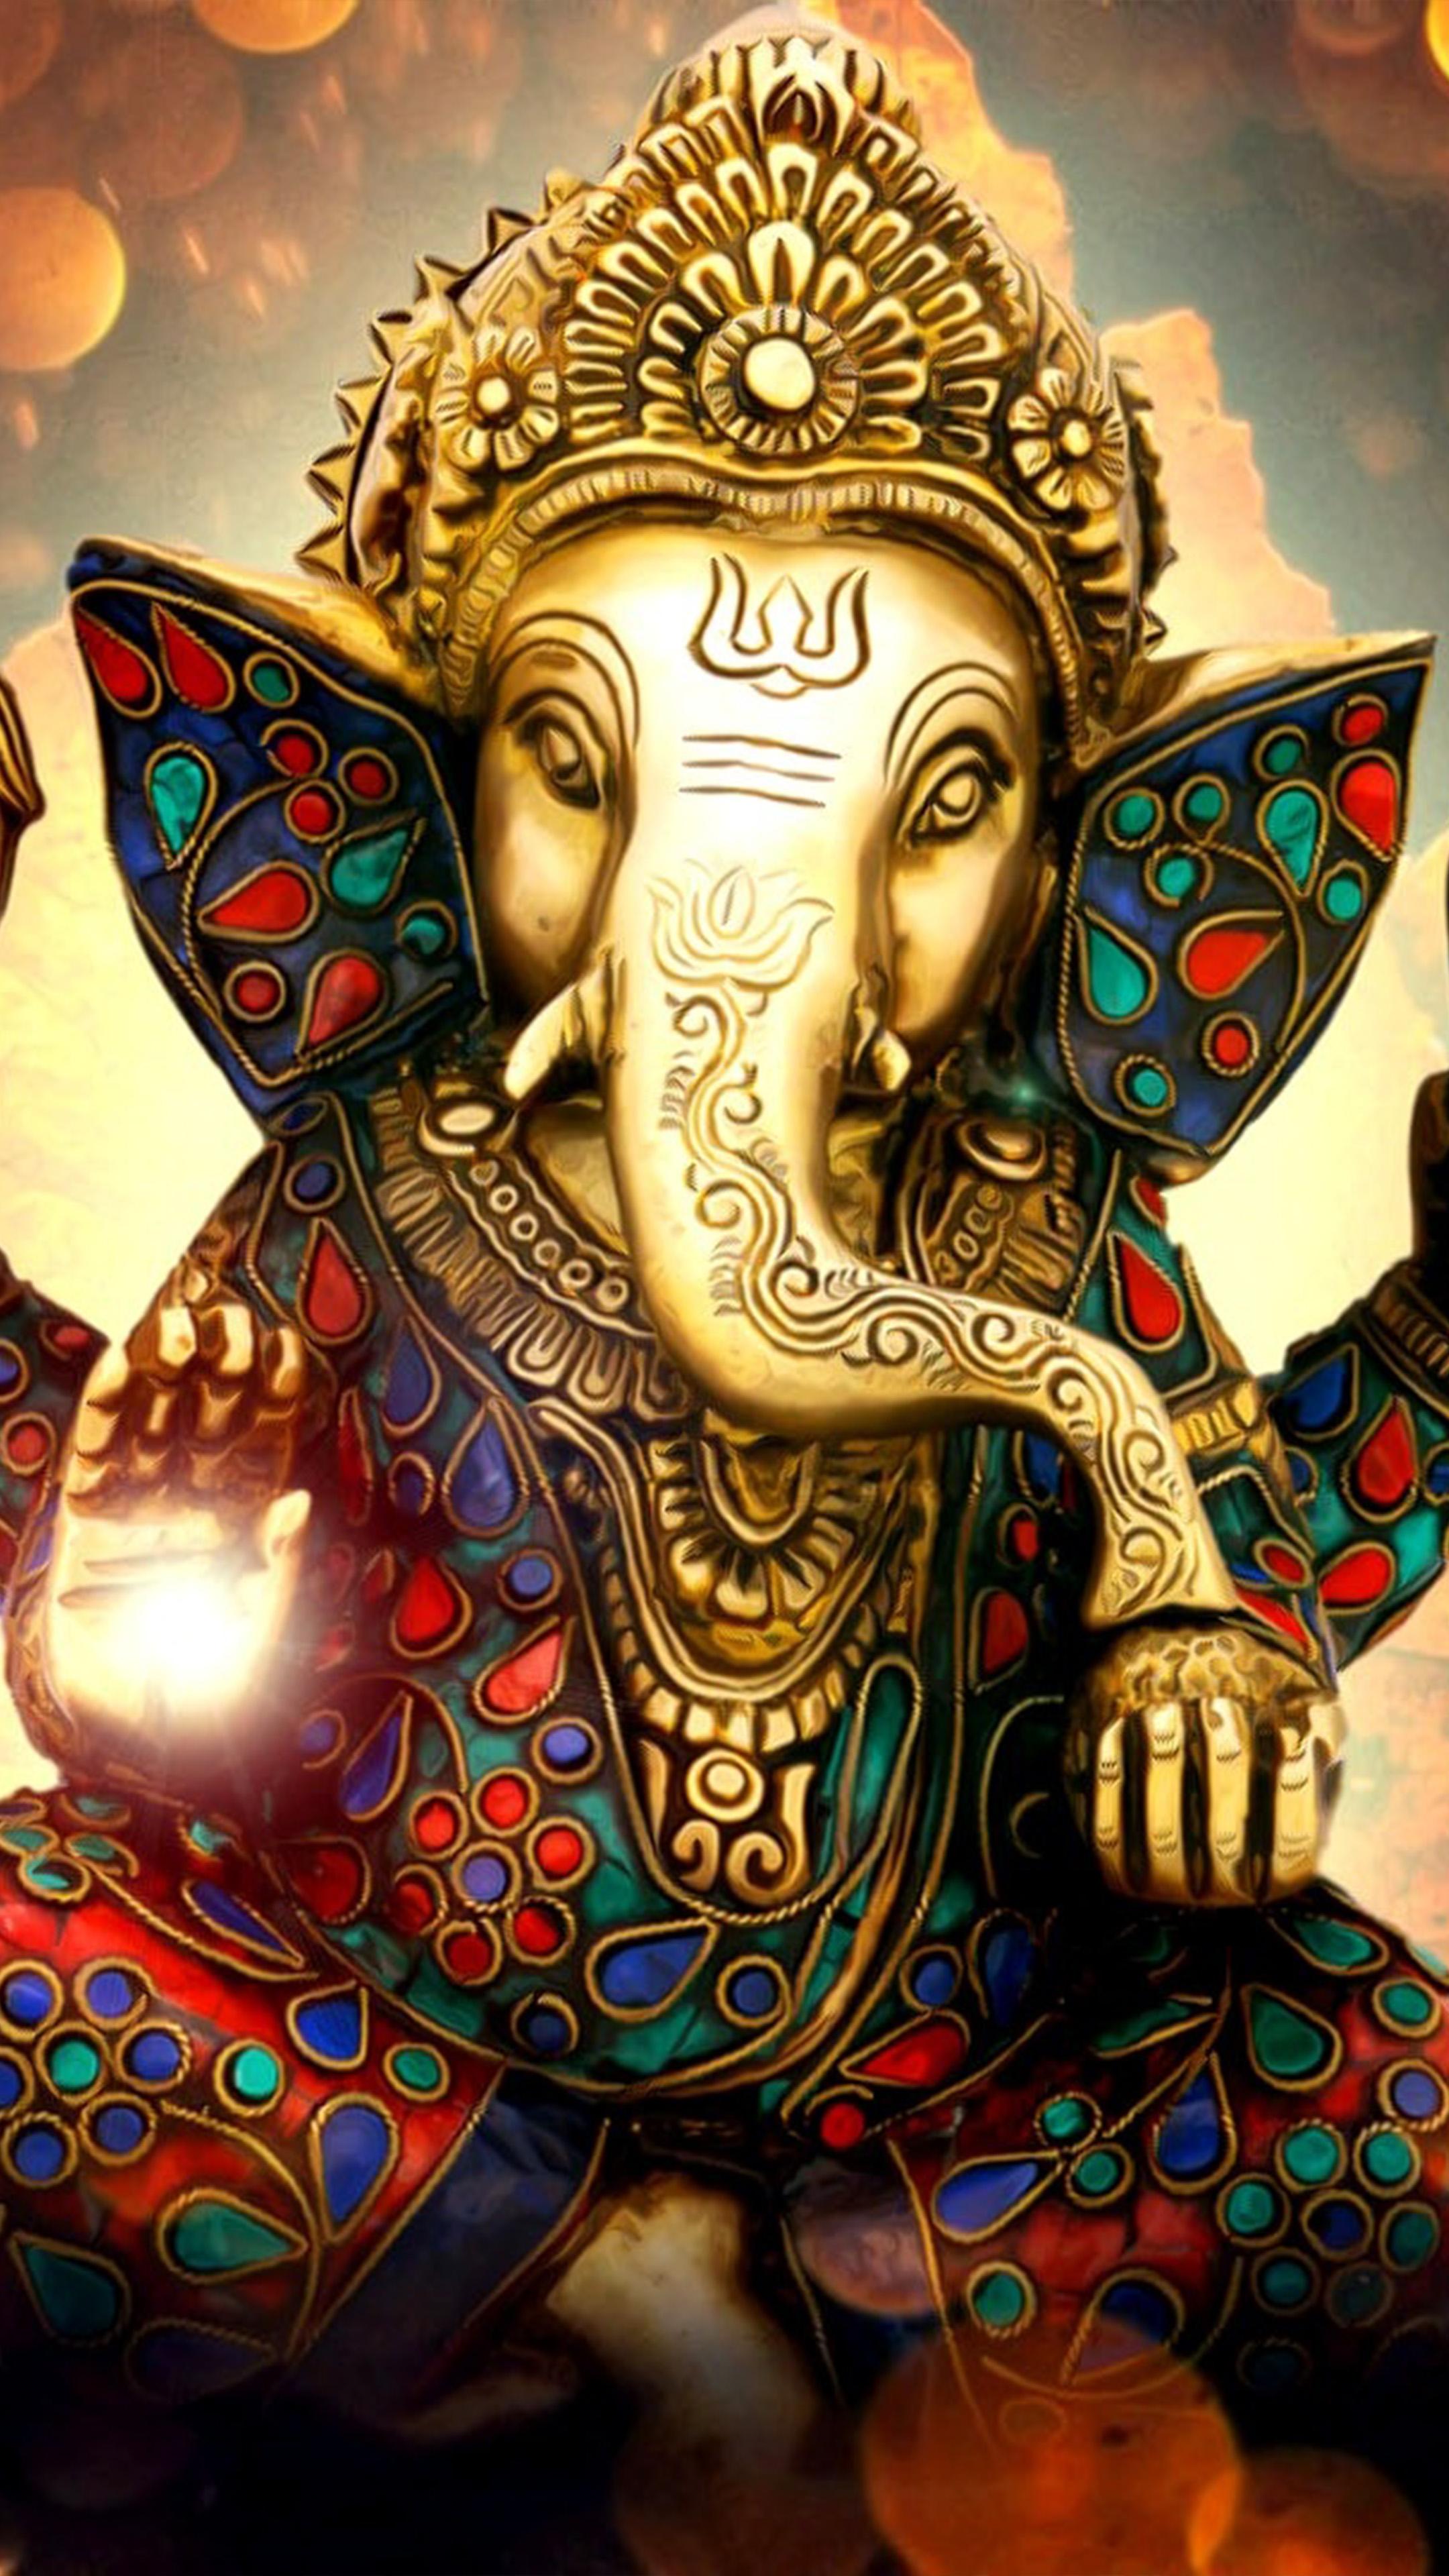 Lord Ganesha Ganapati Statue Idol 4k Ultra Hd Mobile Wallpaper